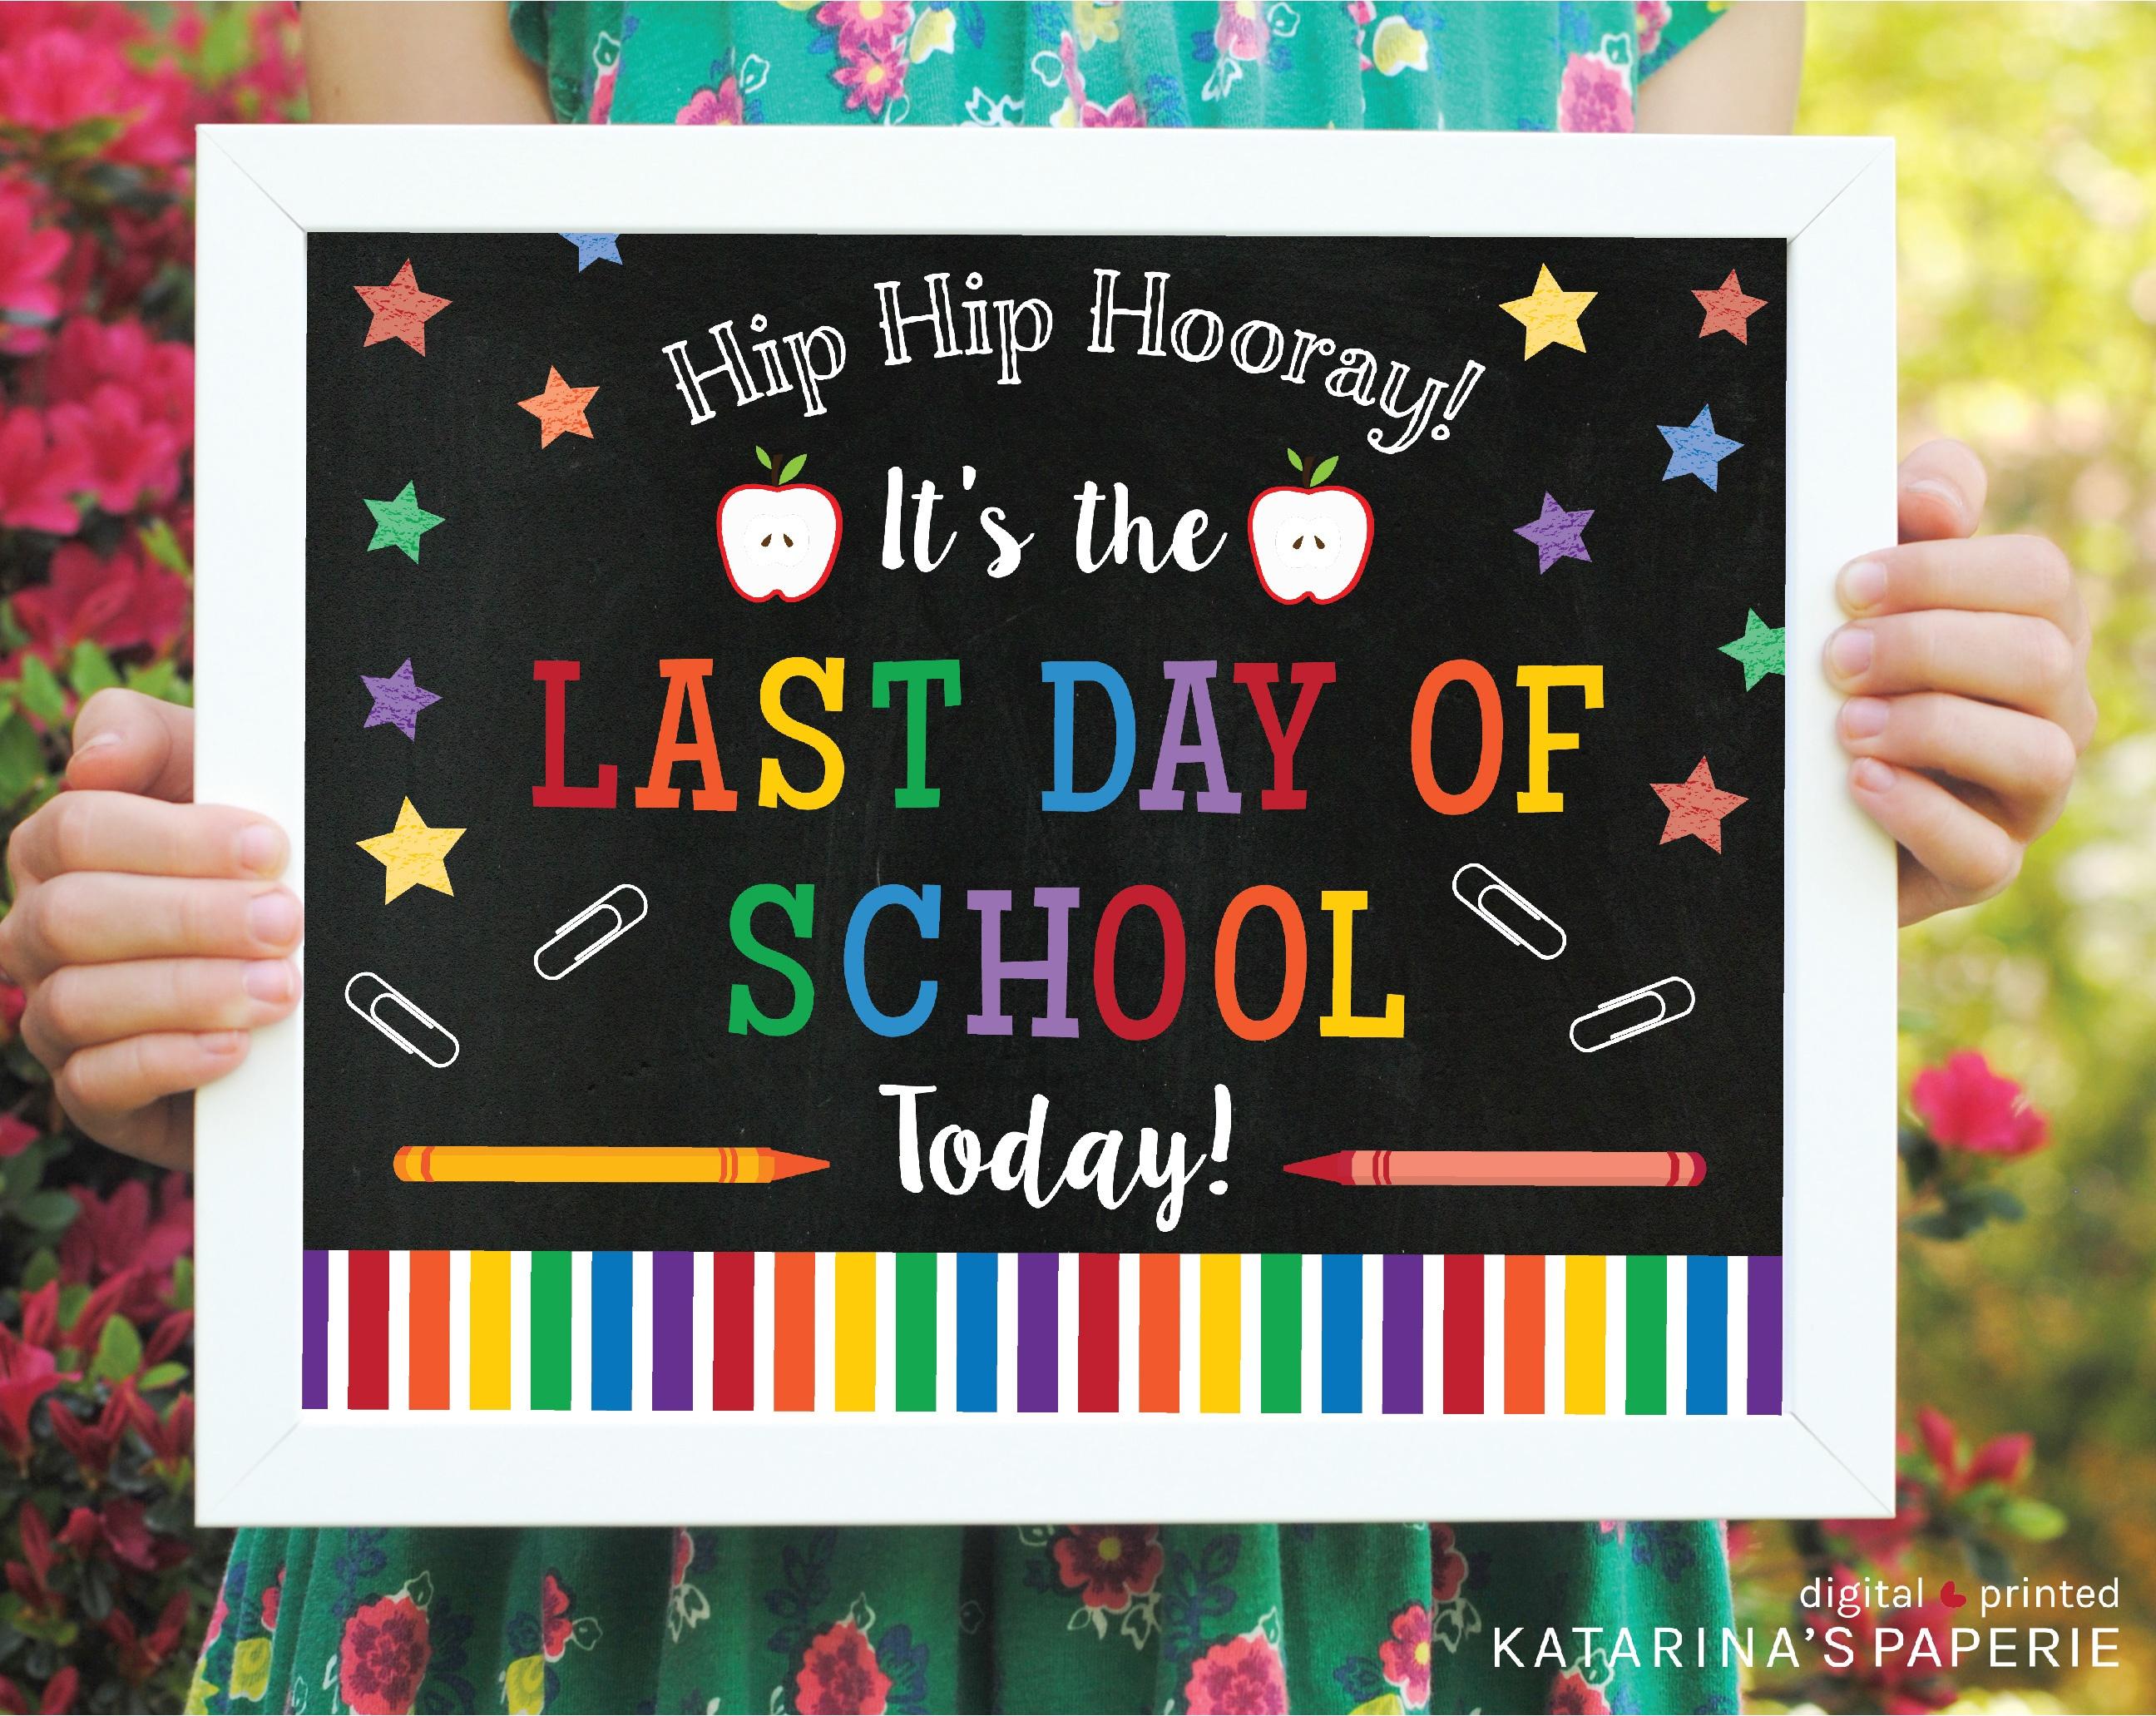 Free Printable - Last Day Of School Chalkboard Sign - Katarina's Paperie - Free Last Day Of School Printables